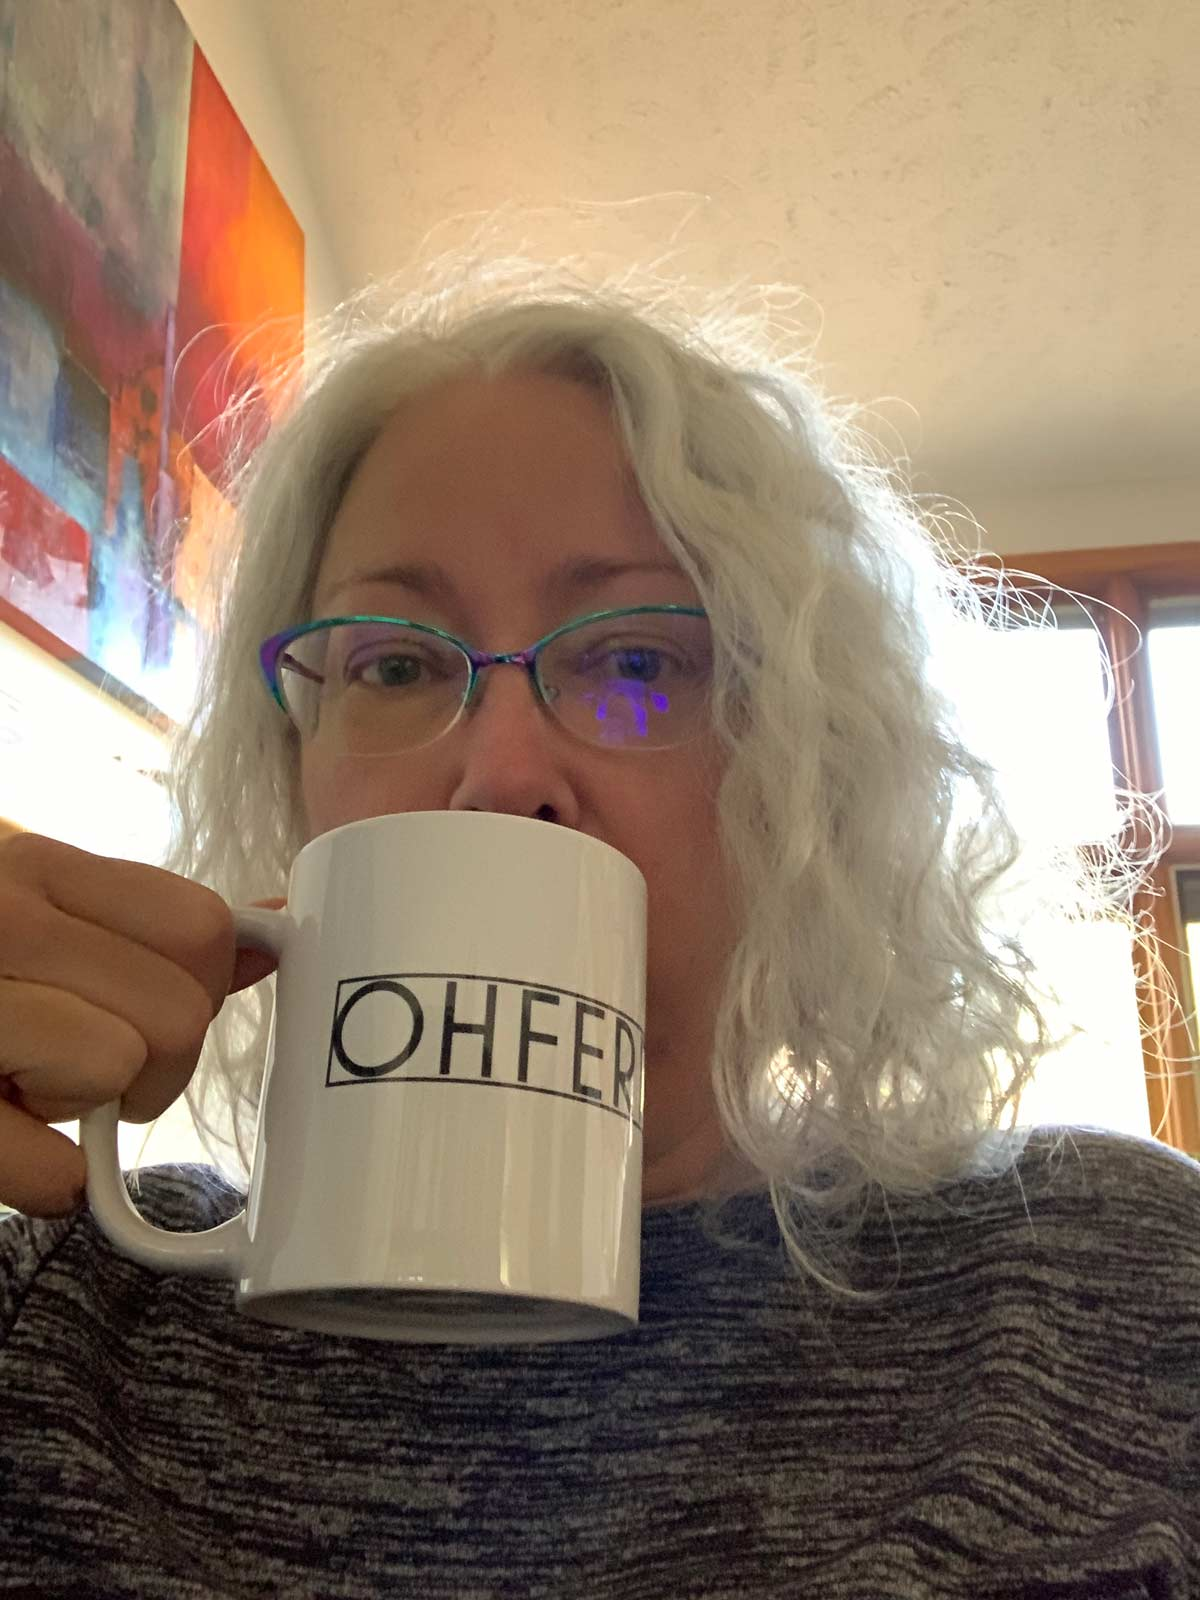 sarah drinking from a coffee mug